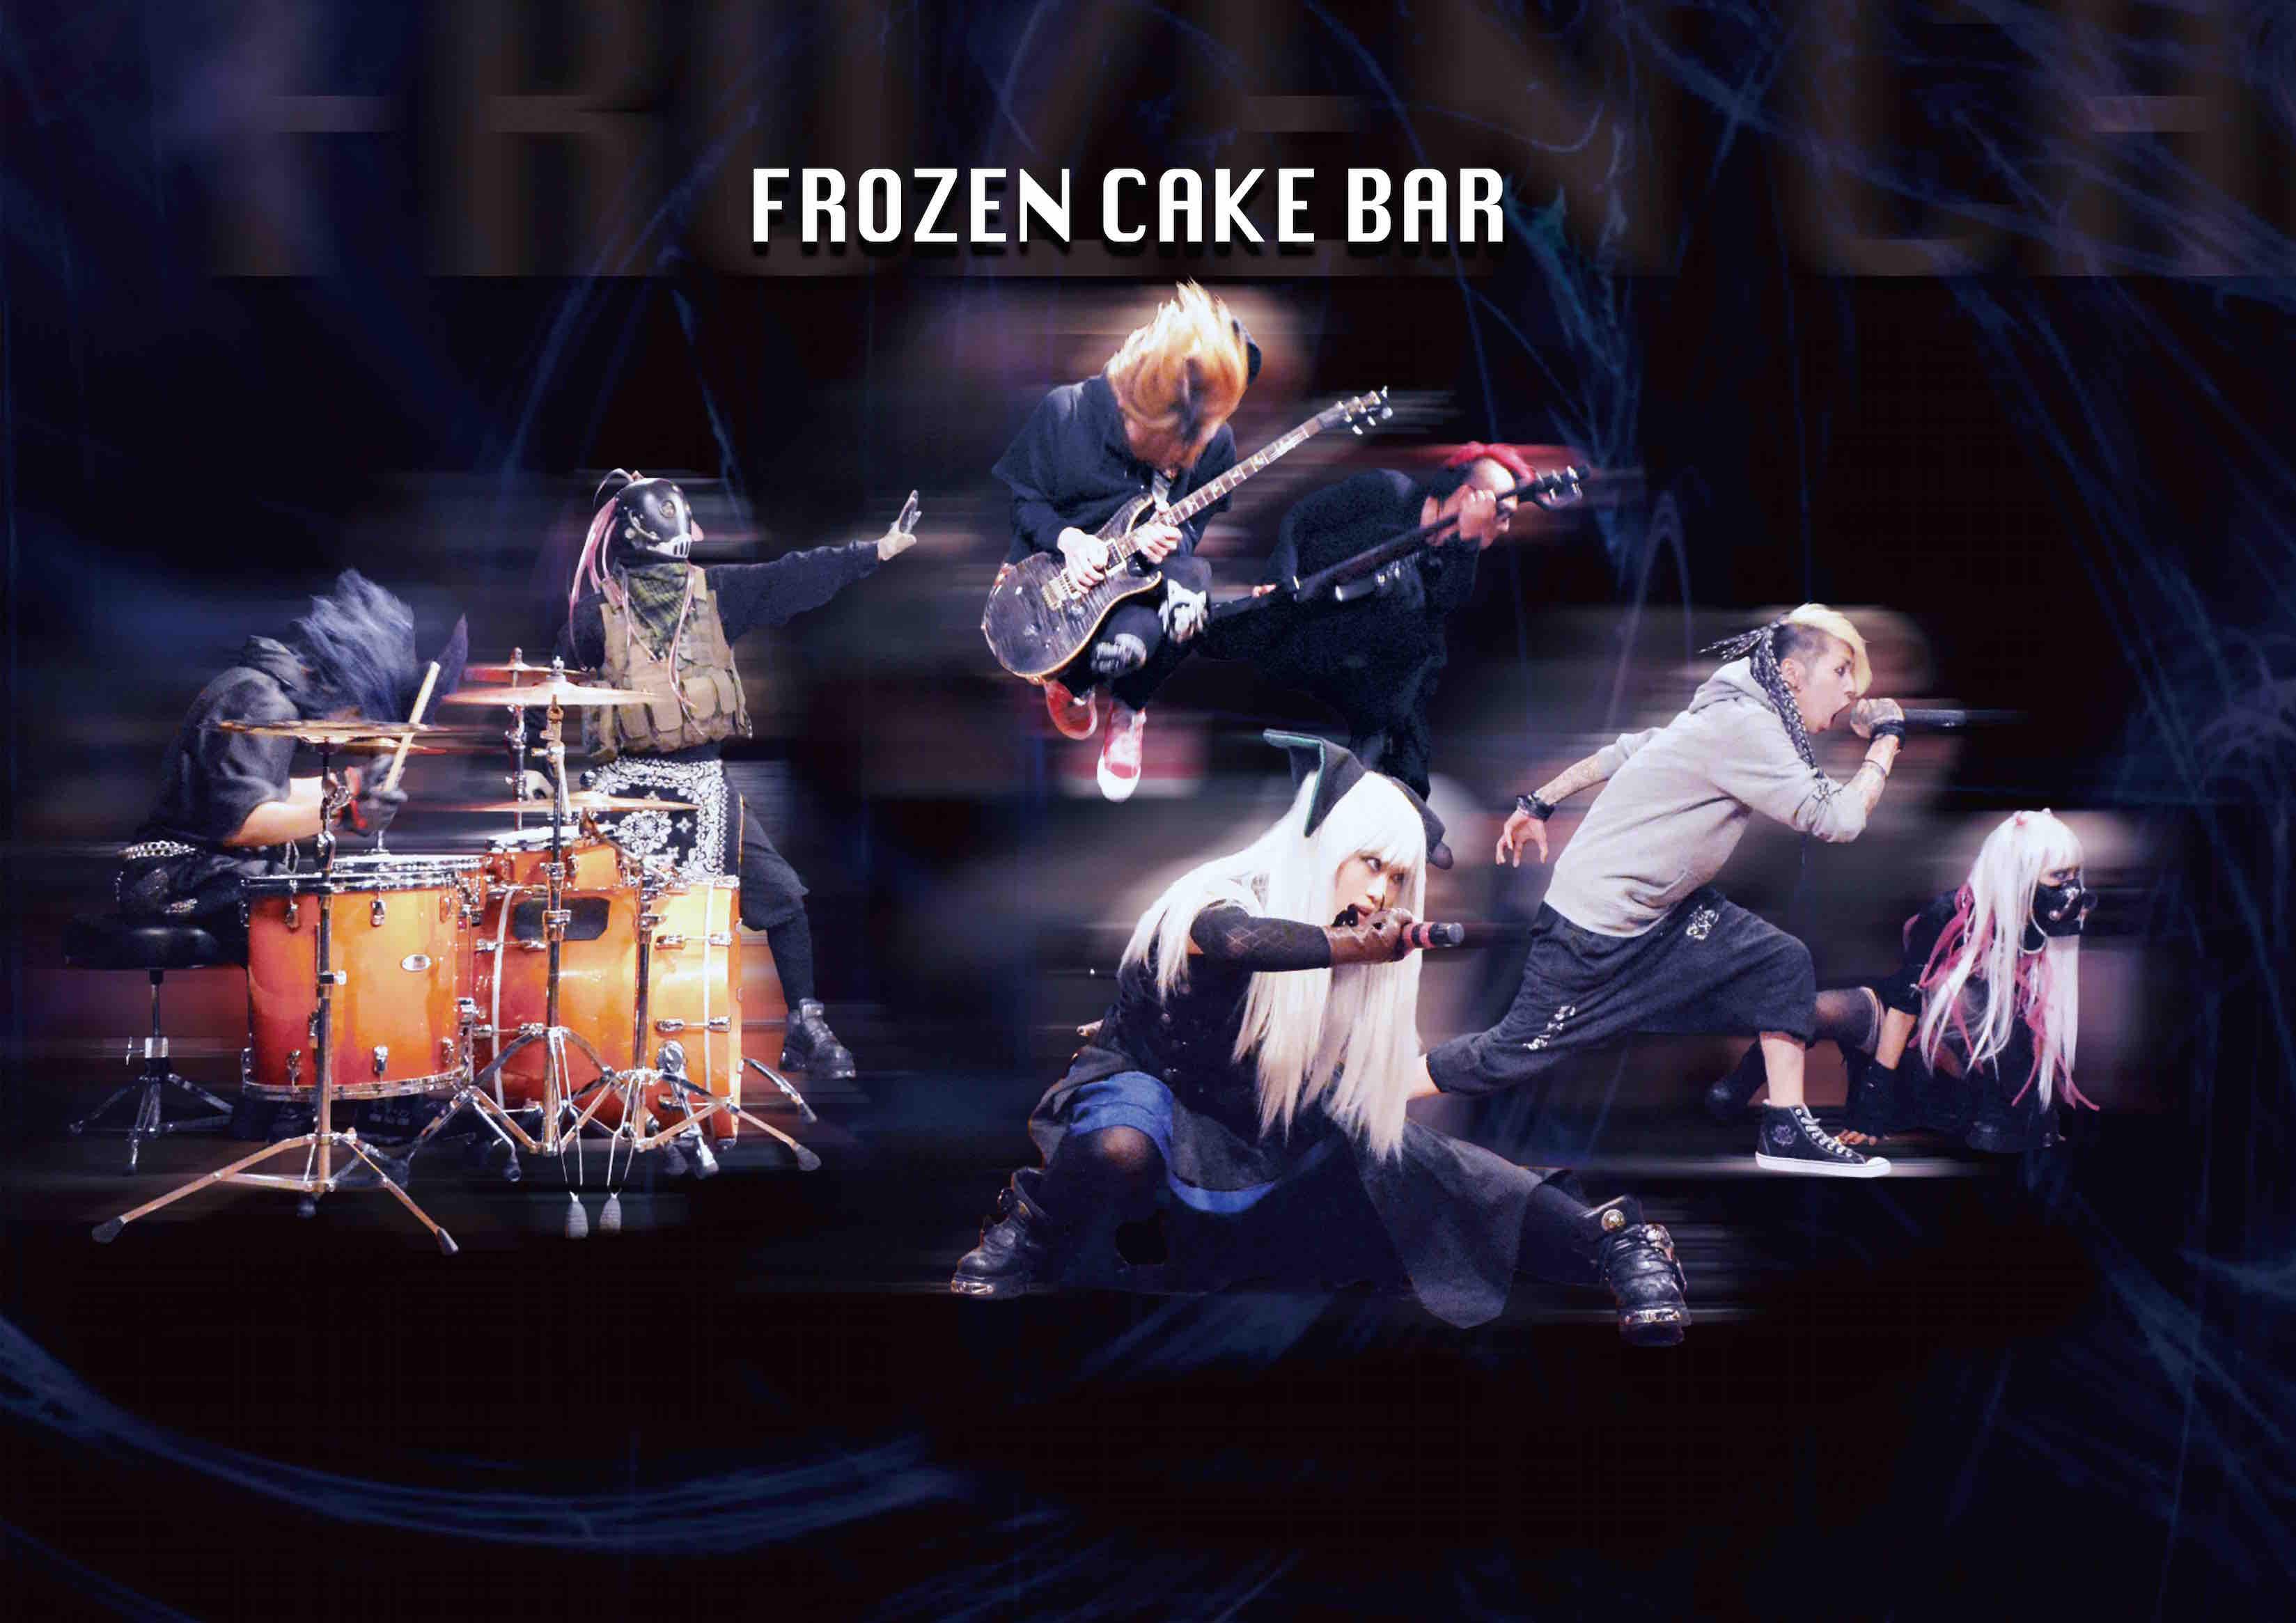 FROZEN CAKE BAR〜チョコ交換クエスト〜-ずっと俺のターンは辛すぎる。チョコトレード会-